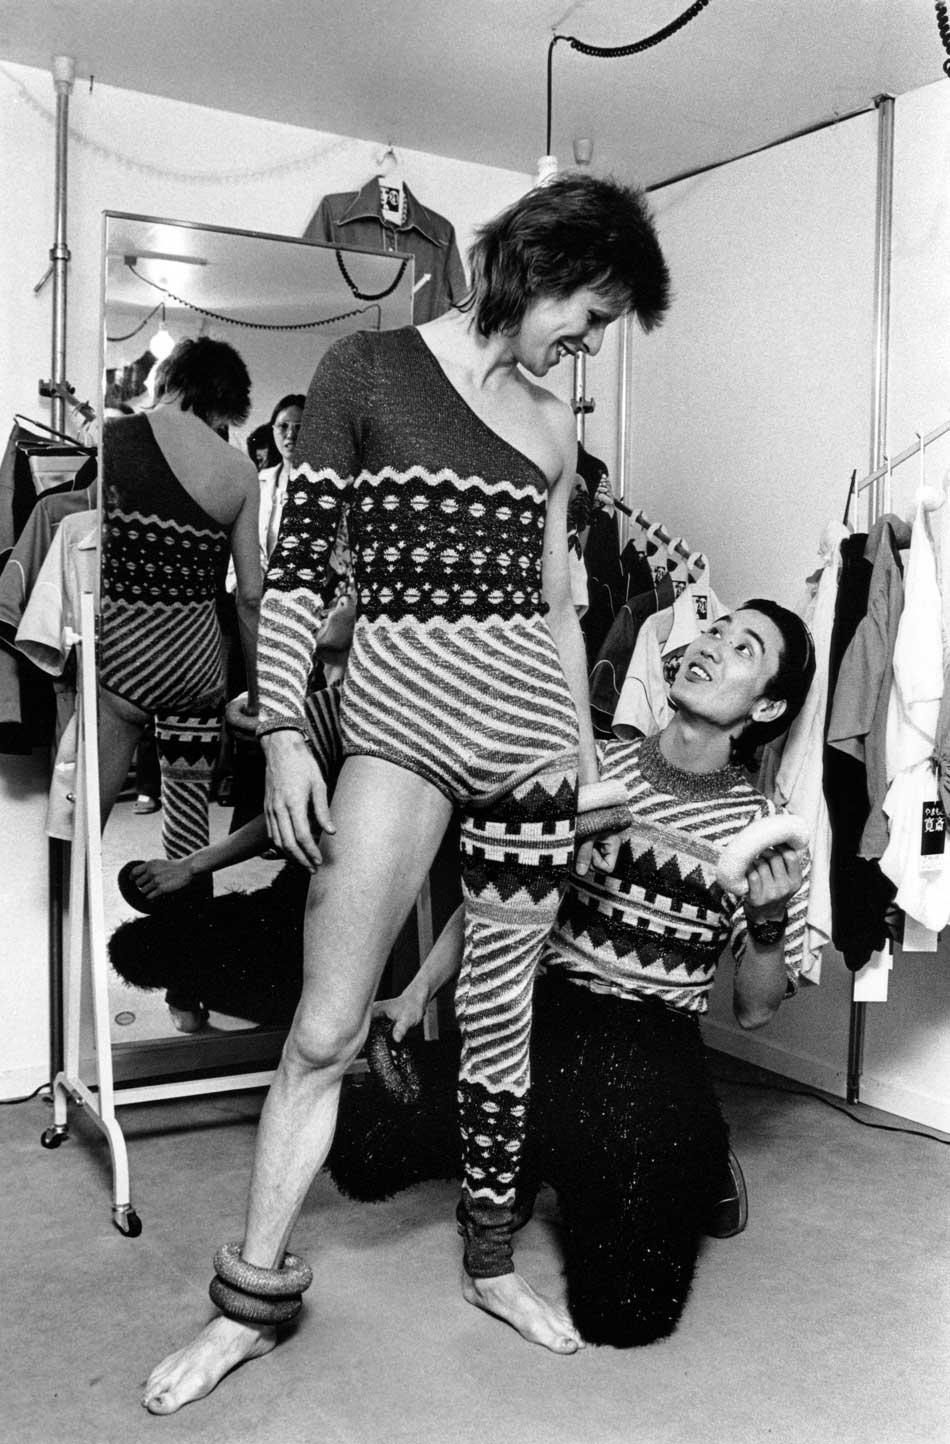 Asymmetric knitted bodysuit, 1973 Designed by Kansai Yamamoto for the Aladdin Sane tour /  Photograph by Masayoshi Sukita © Sukita The David Bowie Archive 2012